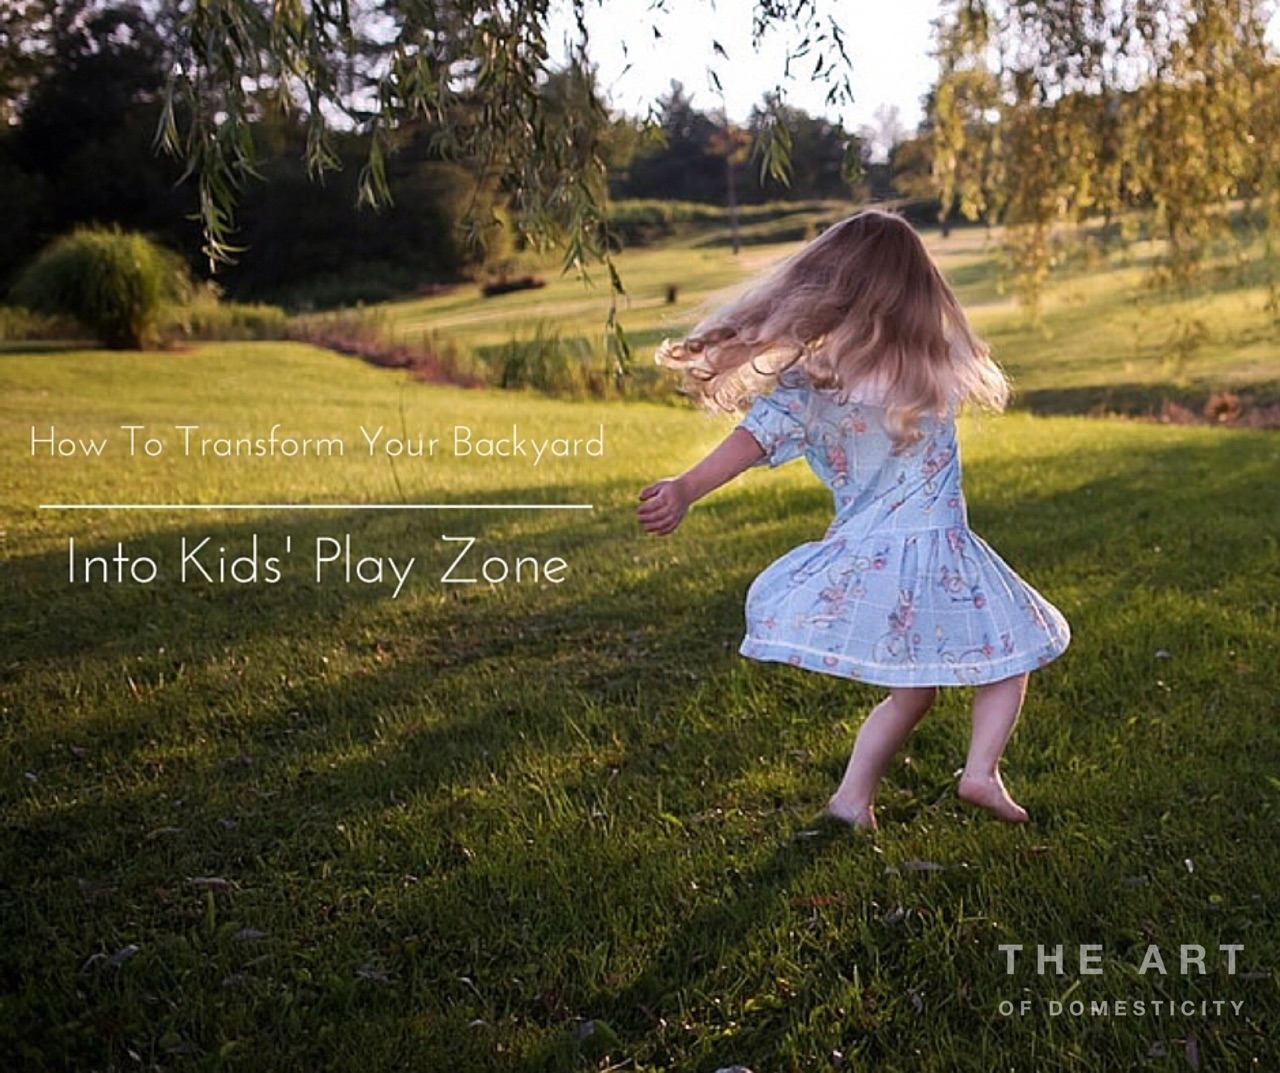 how to transform your backyard into kids play zone